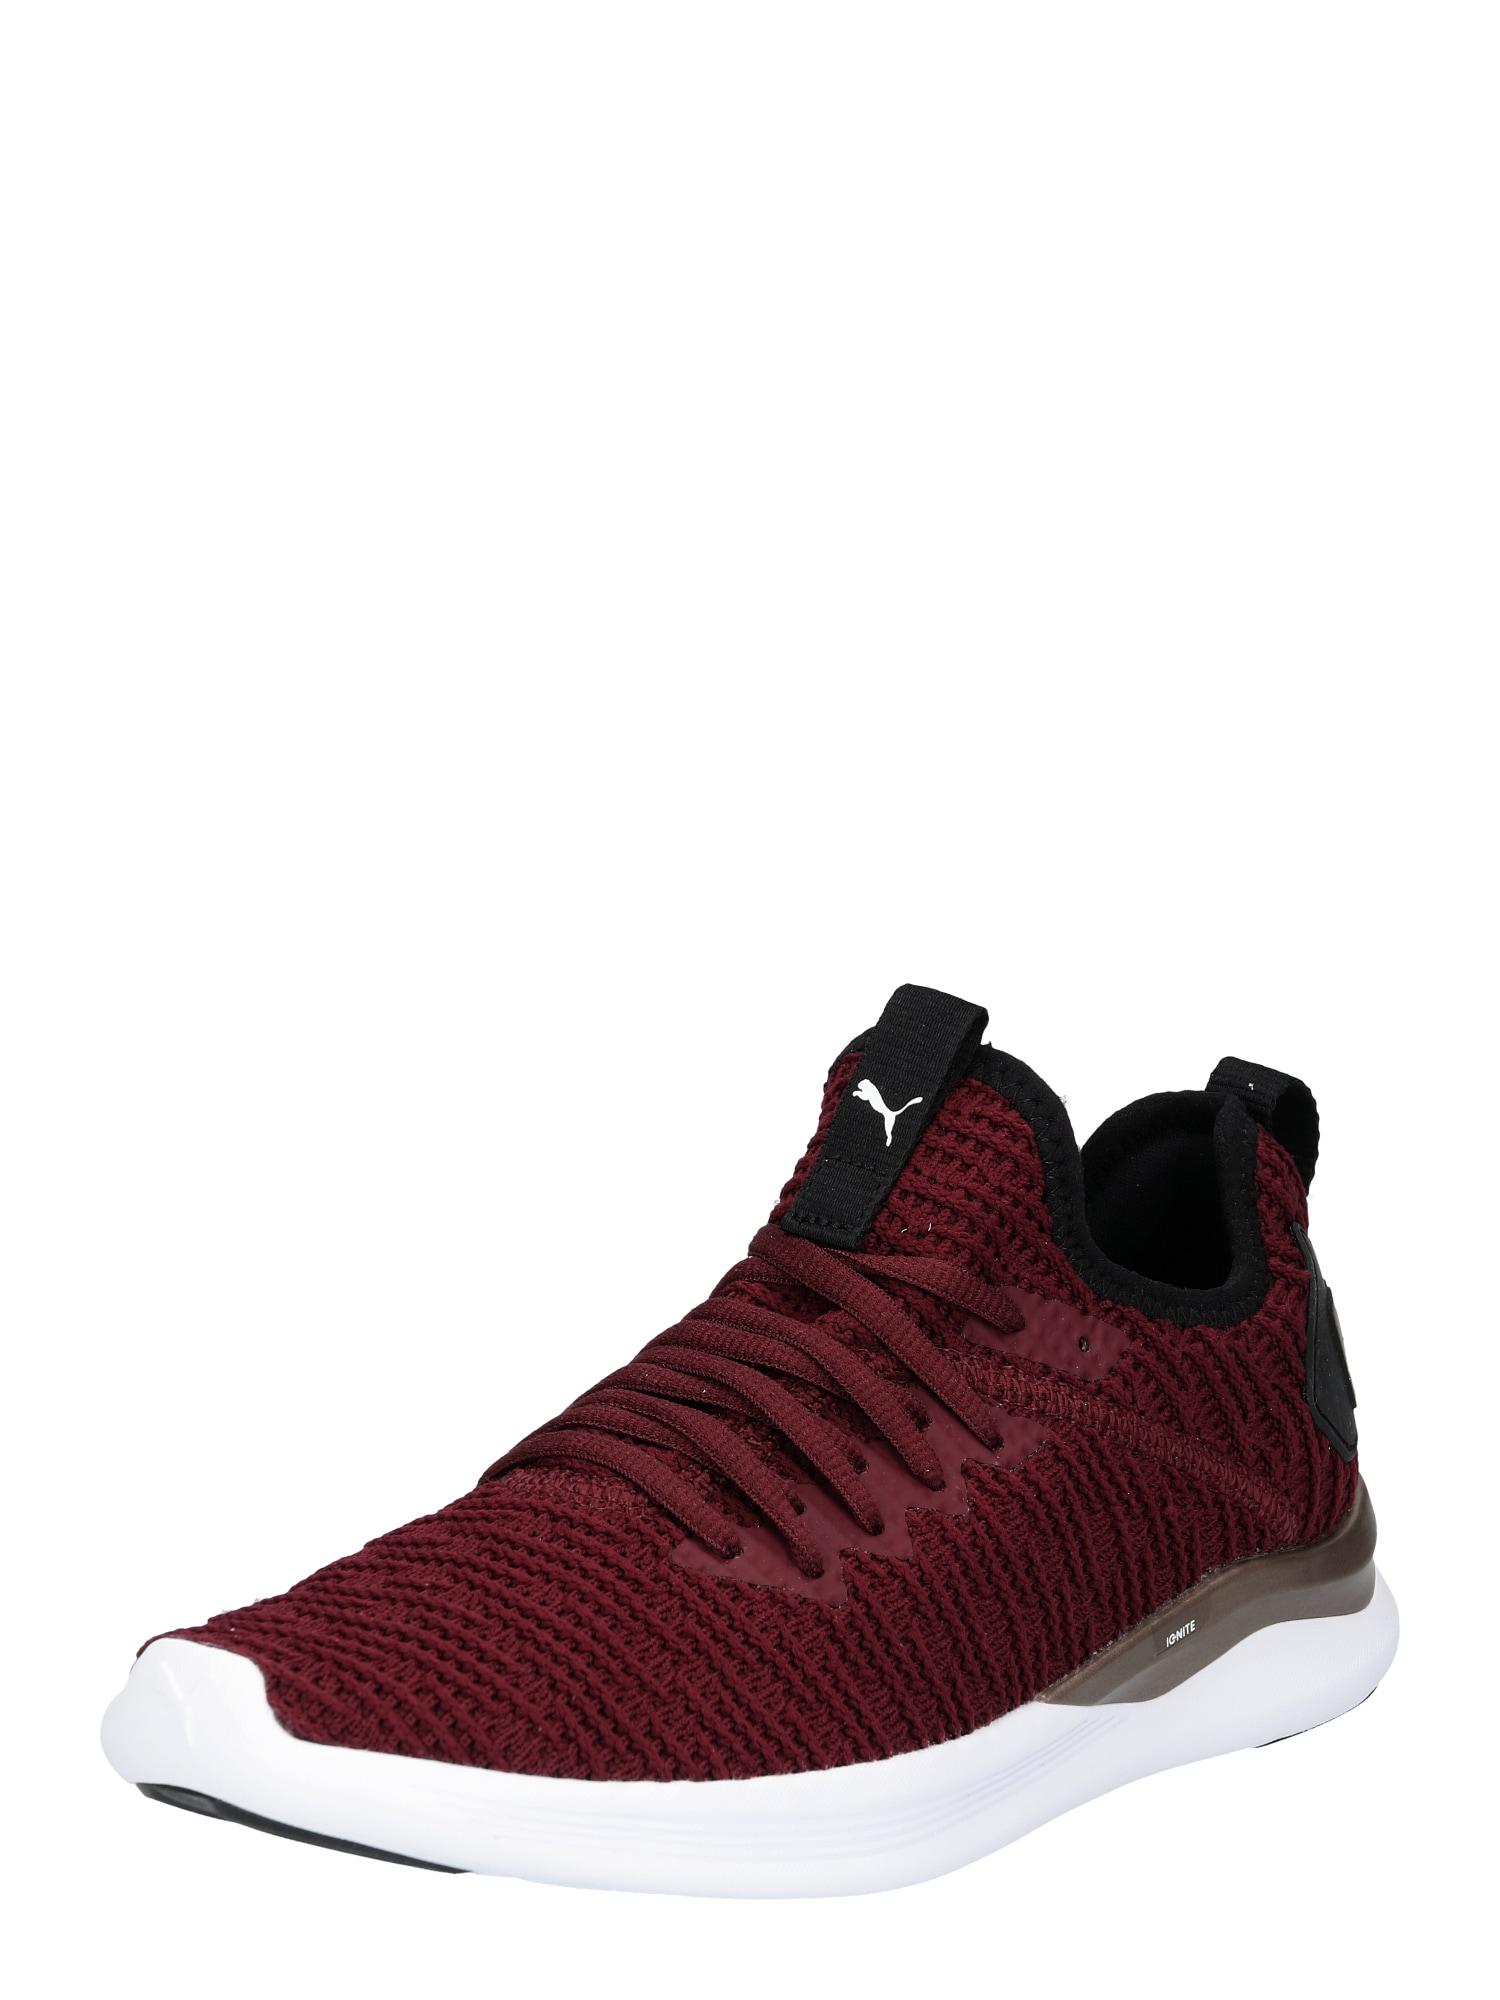 Běžecká obuv Ignite Flash Luxe bordó černá PUMA